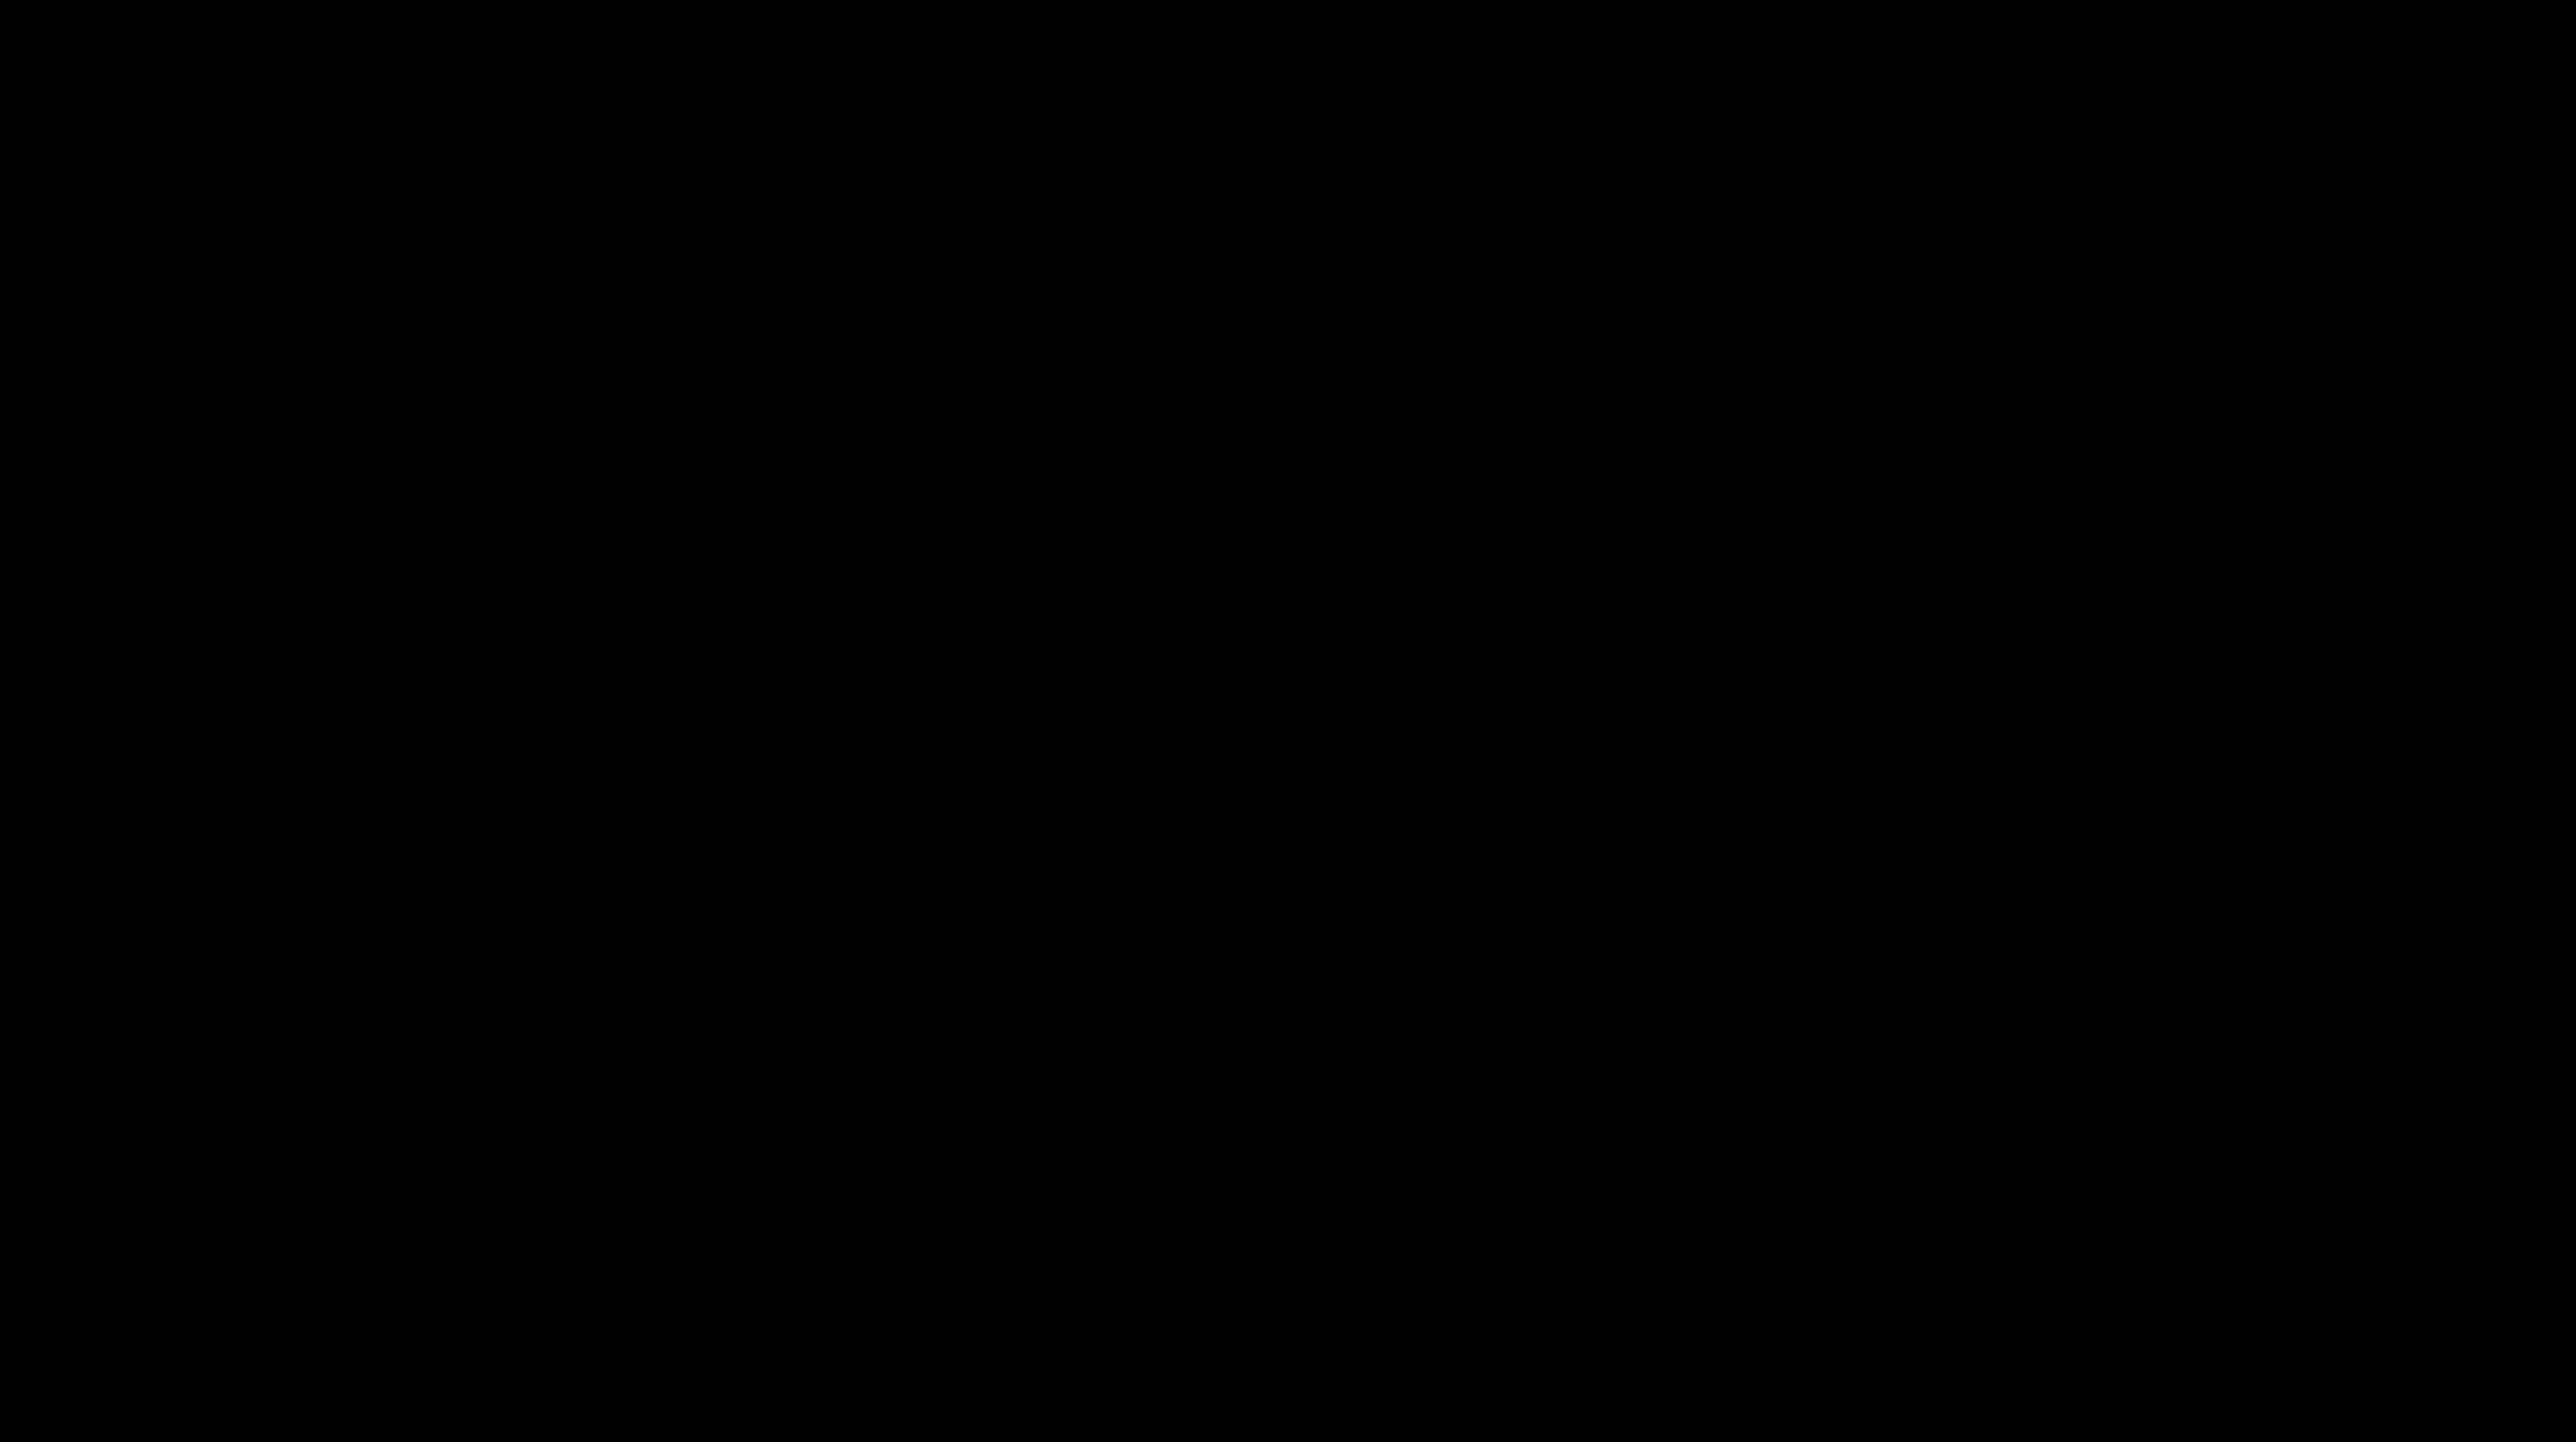 Seraphin edgewood